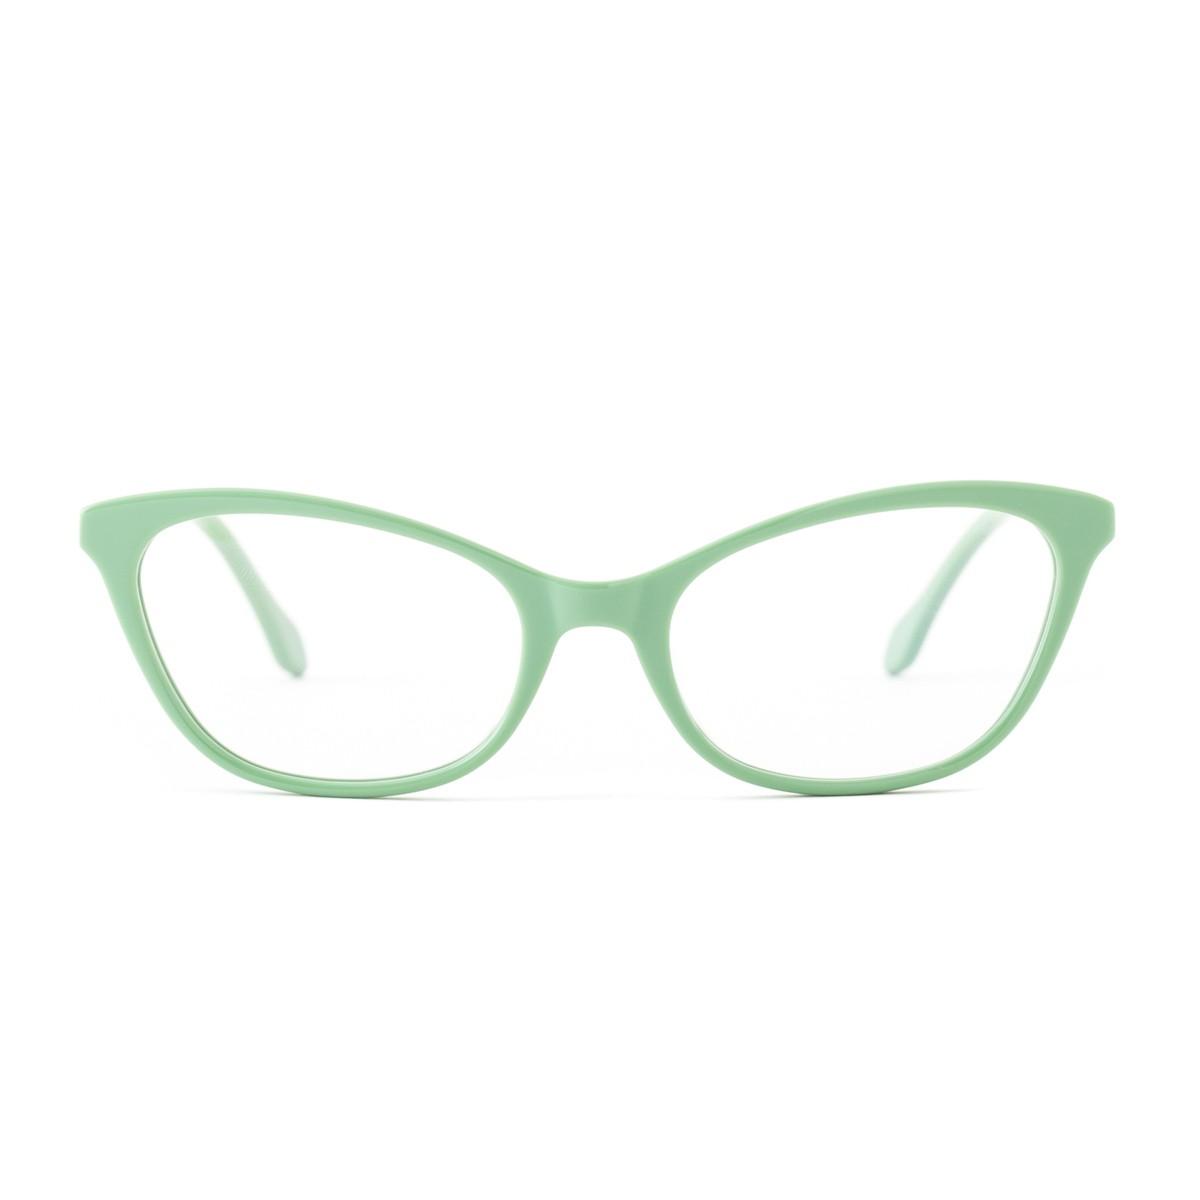 Germano Gambini GG54 | Women's eyeglasses